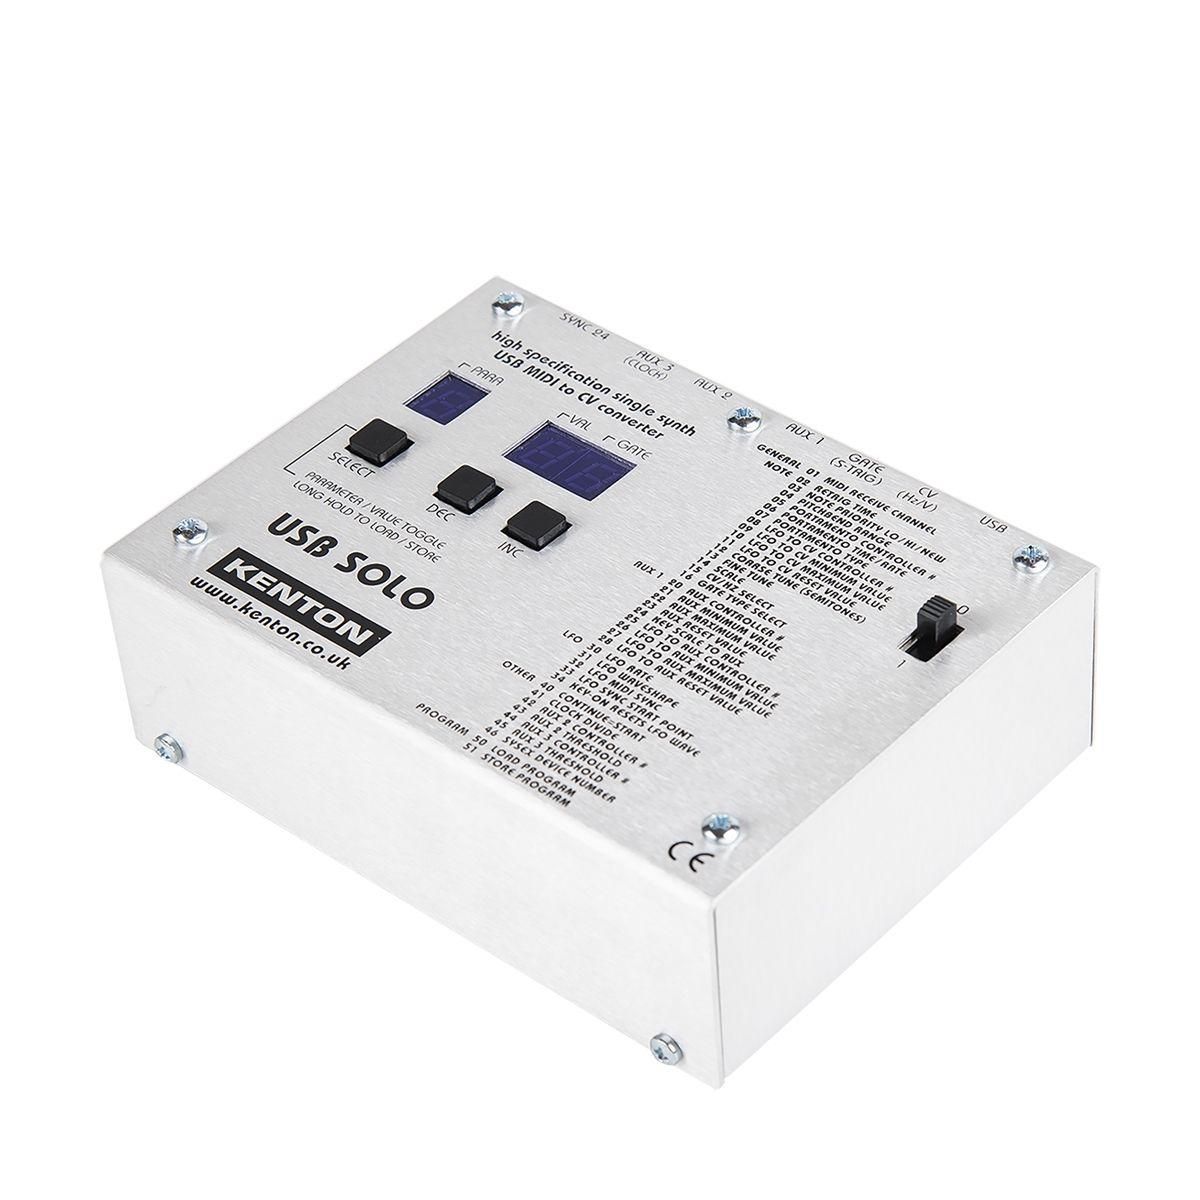 Kenton ElectronicsUSB Solo USB MIDI to CV/Gate Convertor